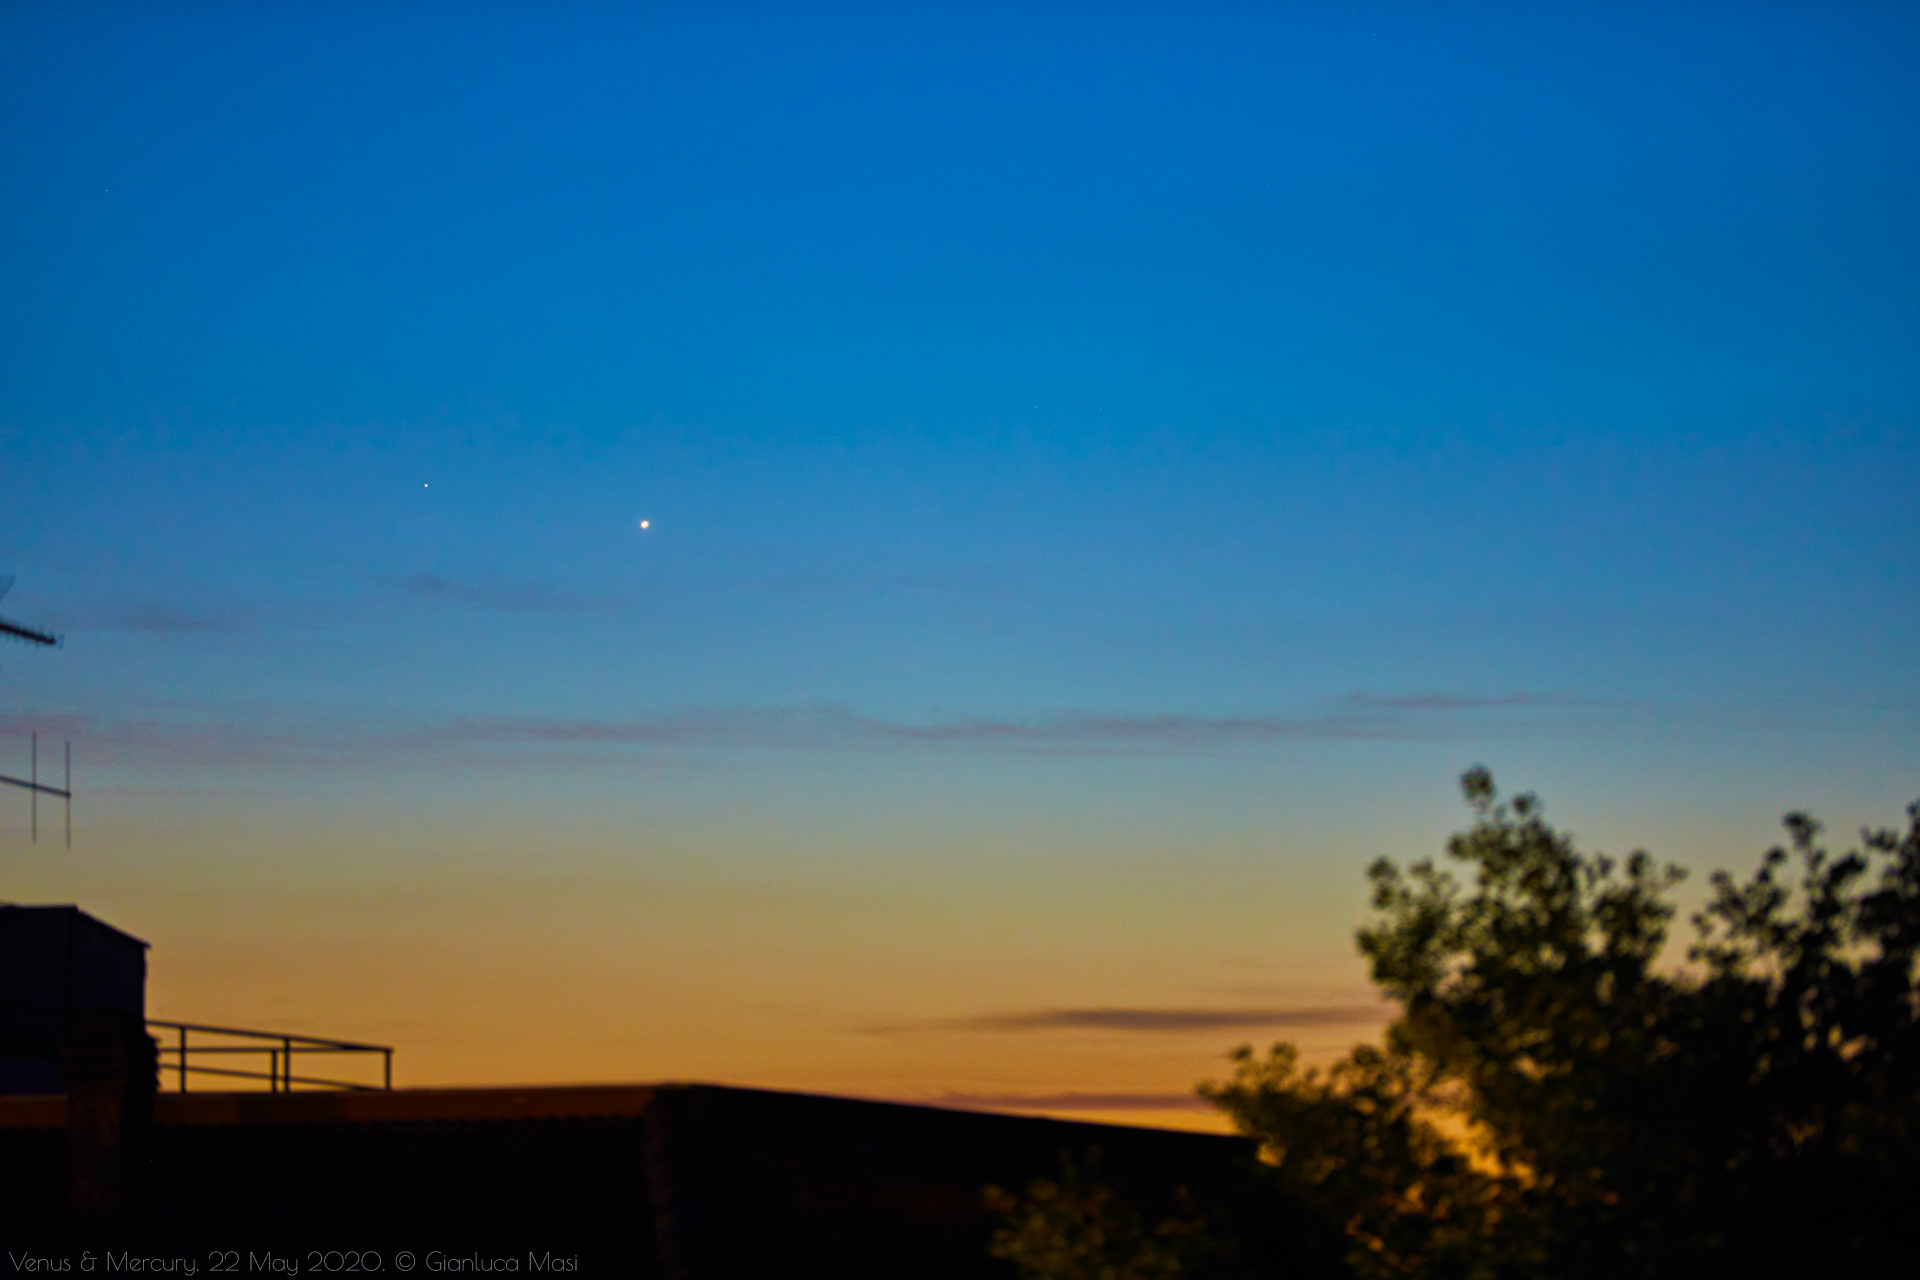 Venus and Mercury prepare to set together - 22 May 2020.